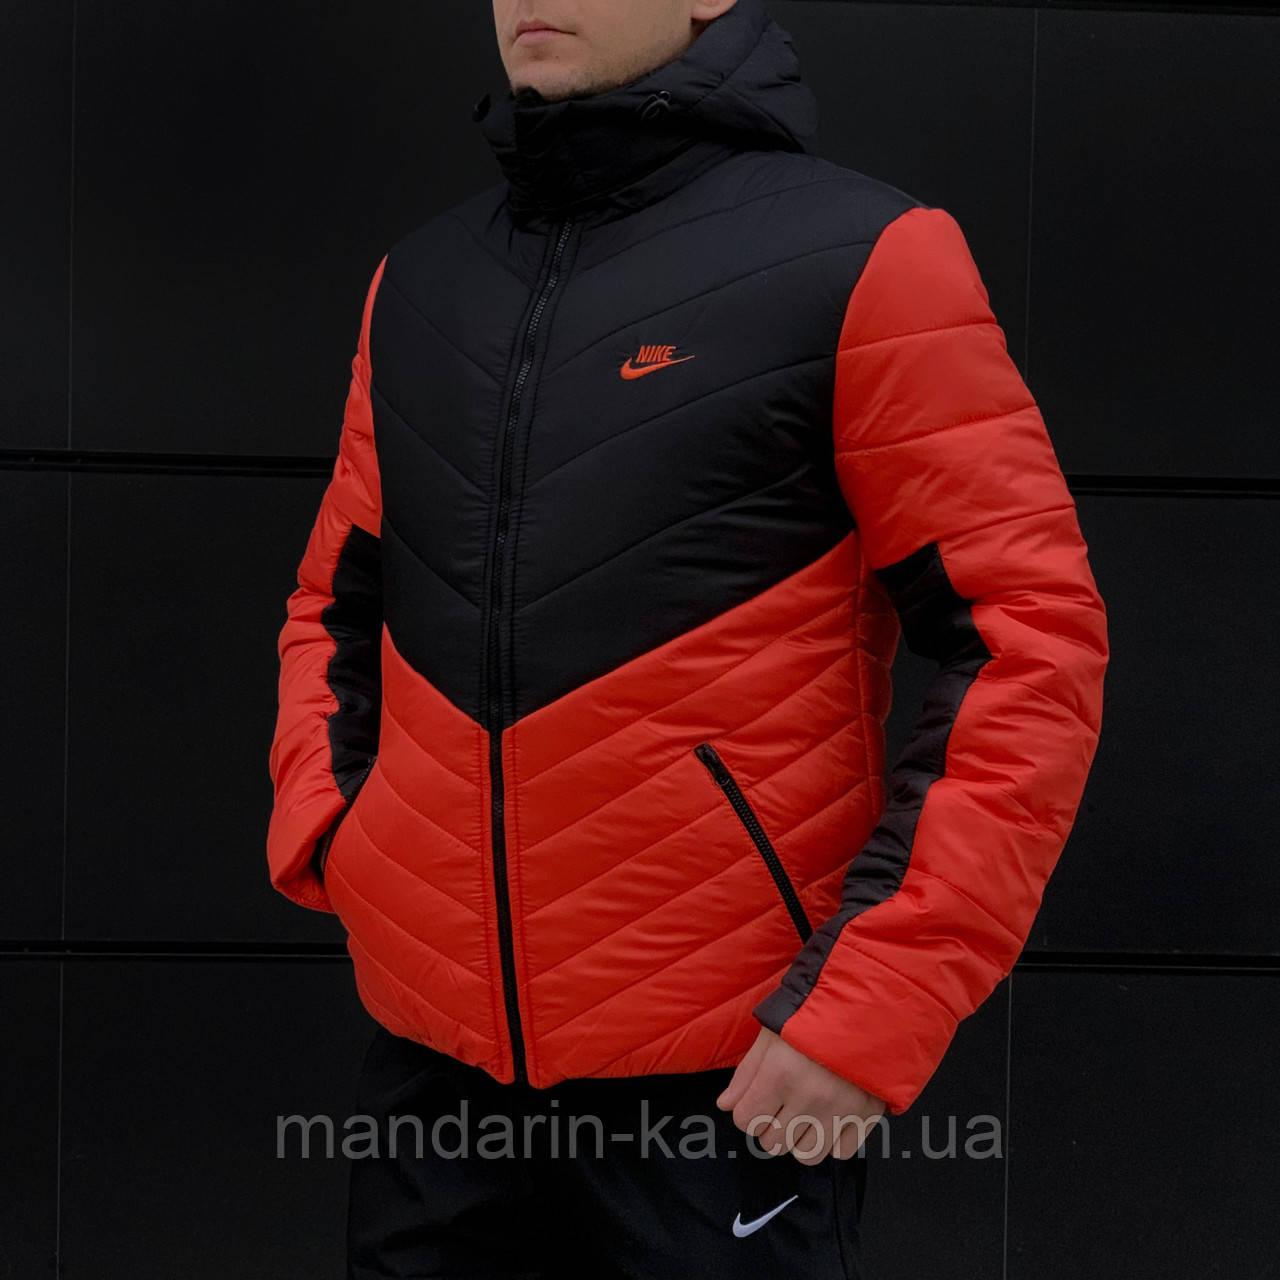 Зимняя  мужская куртка   Nike Найк    (реплика)